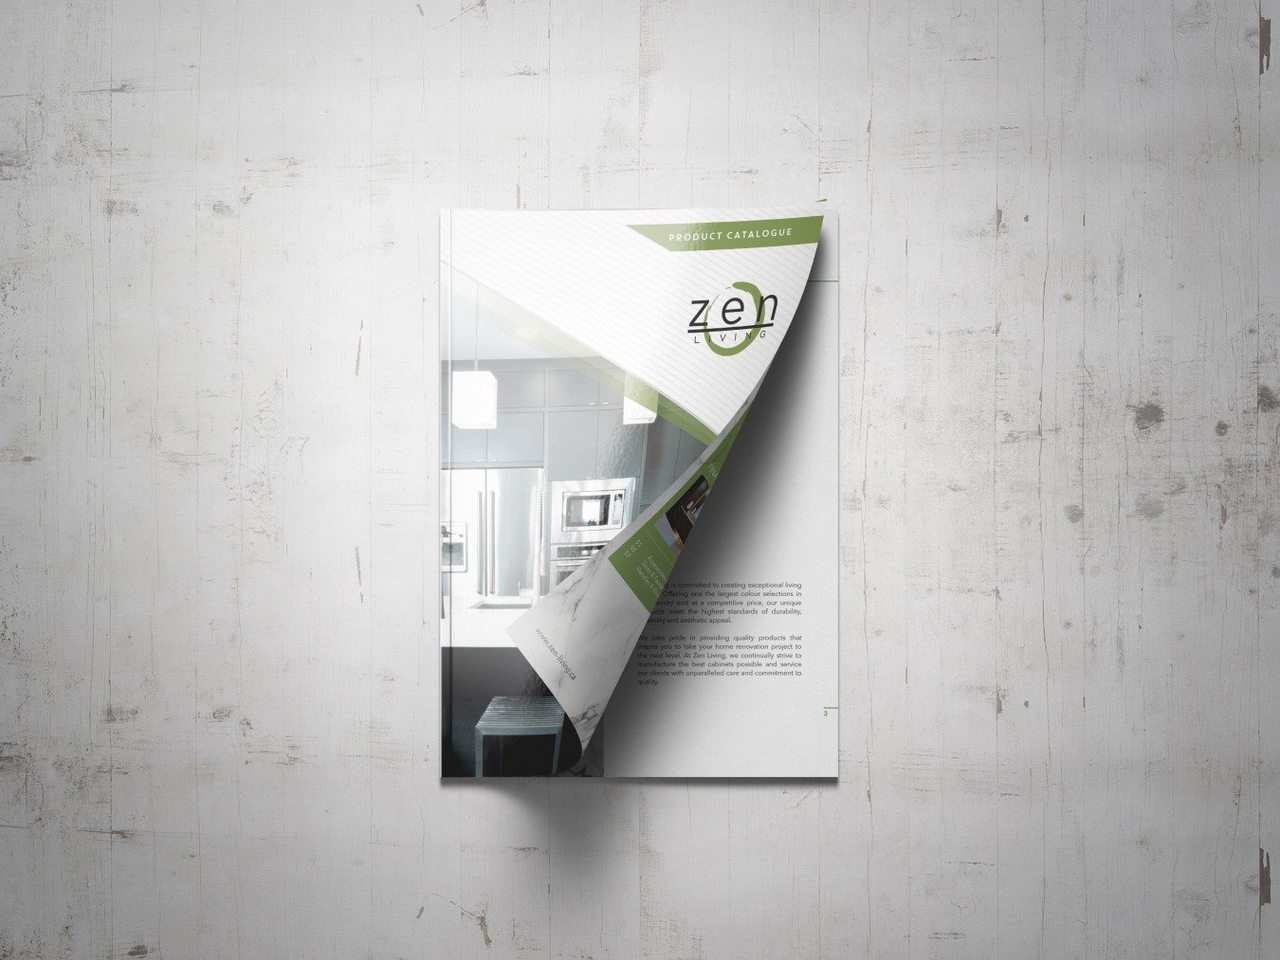 Zen_Living_Catalogue_Presentation_01